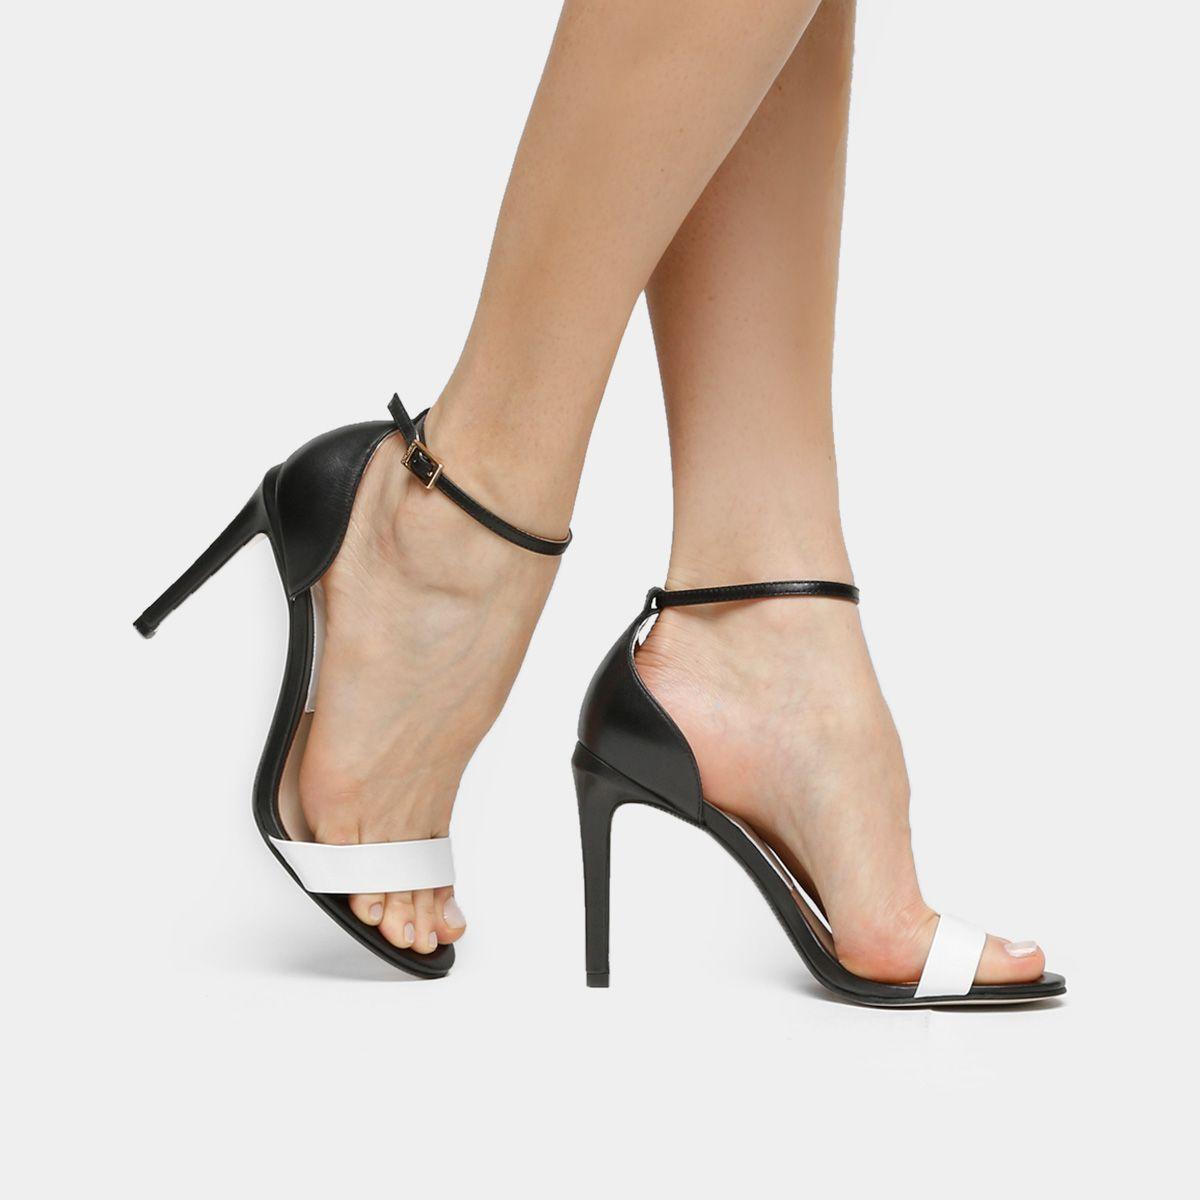 6d26462a6b Compre Sandália Dumond Salto Fino Preto e Branco na Zattini a nova loja de  moda online da Netshoes. Encontre Sapatos